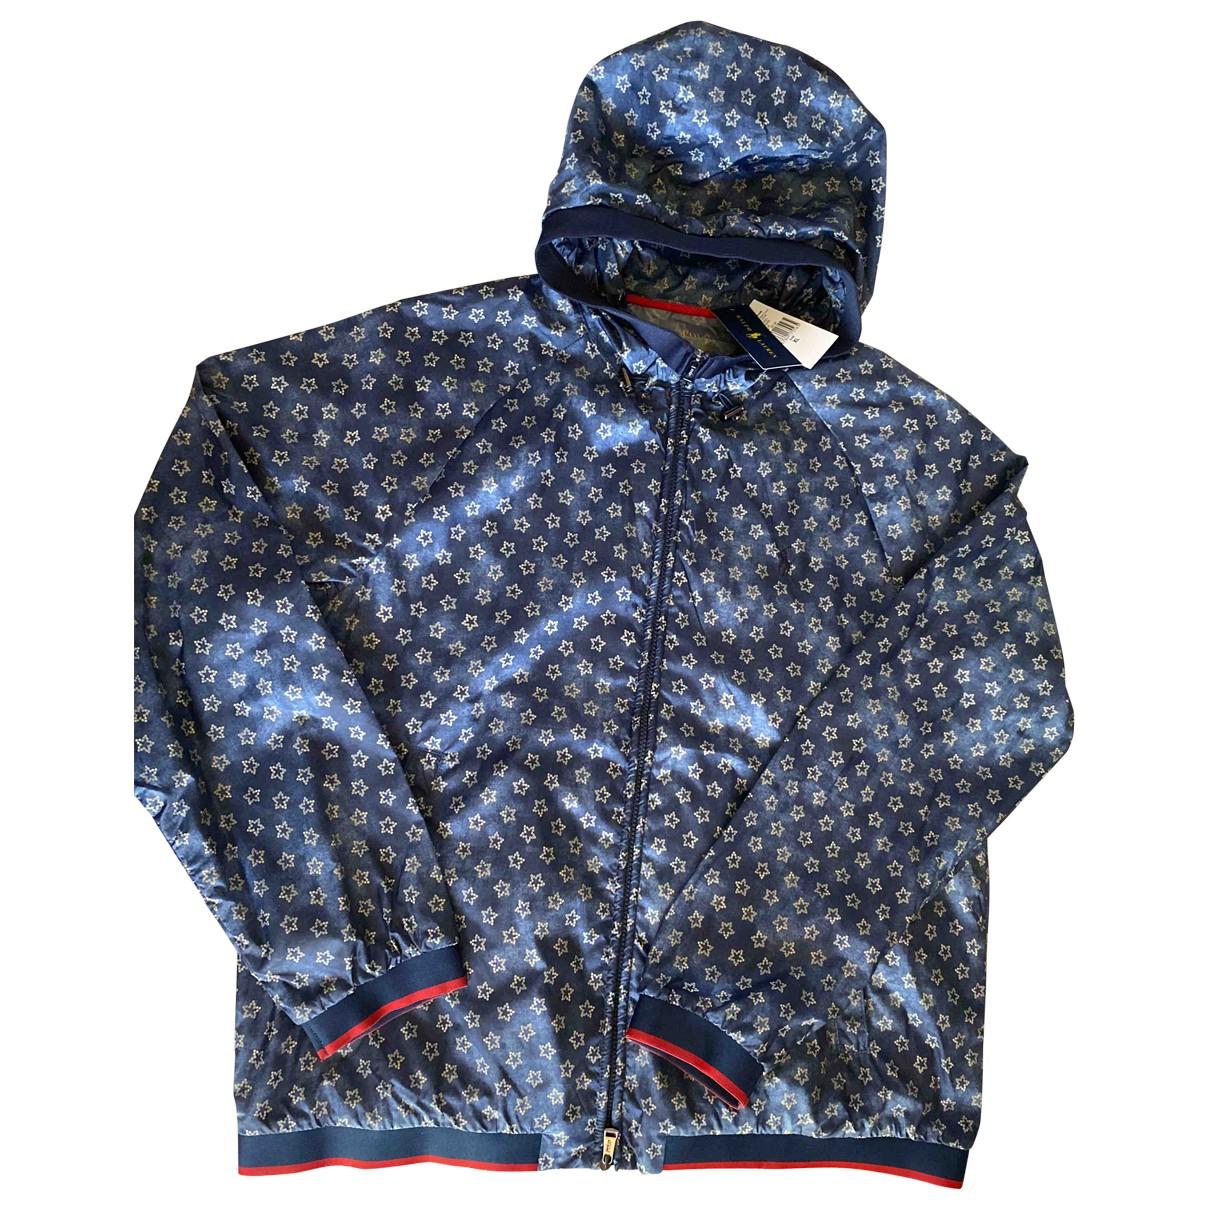 Polo Ralph Lauren \N Blue jacket  for Men XL International